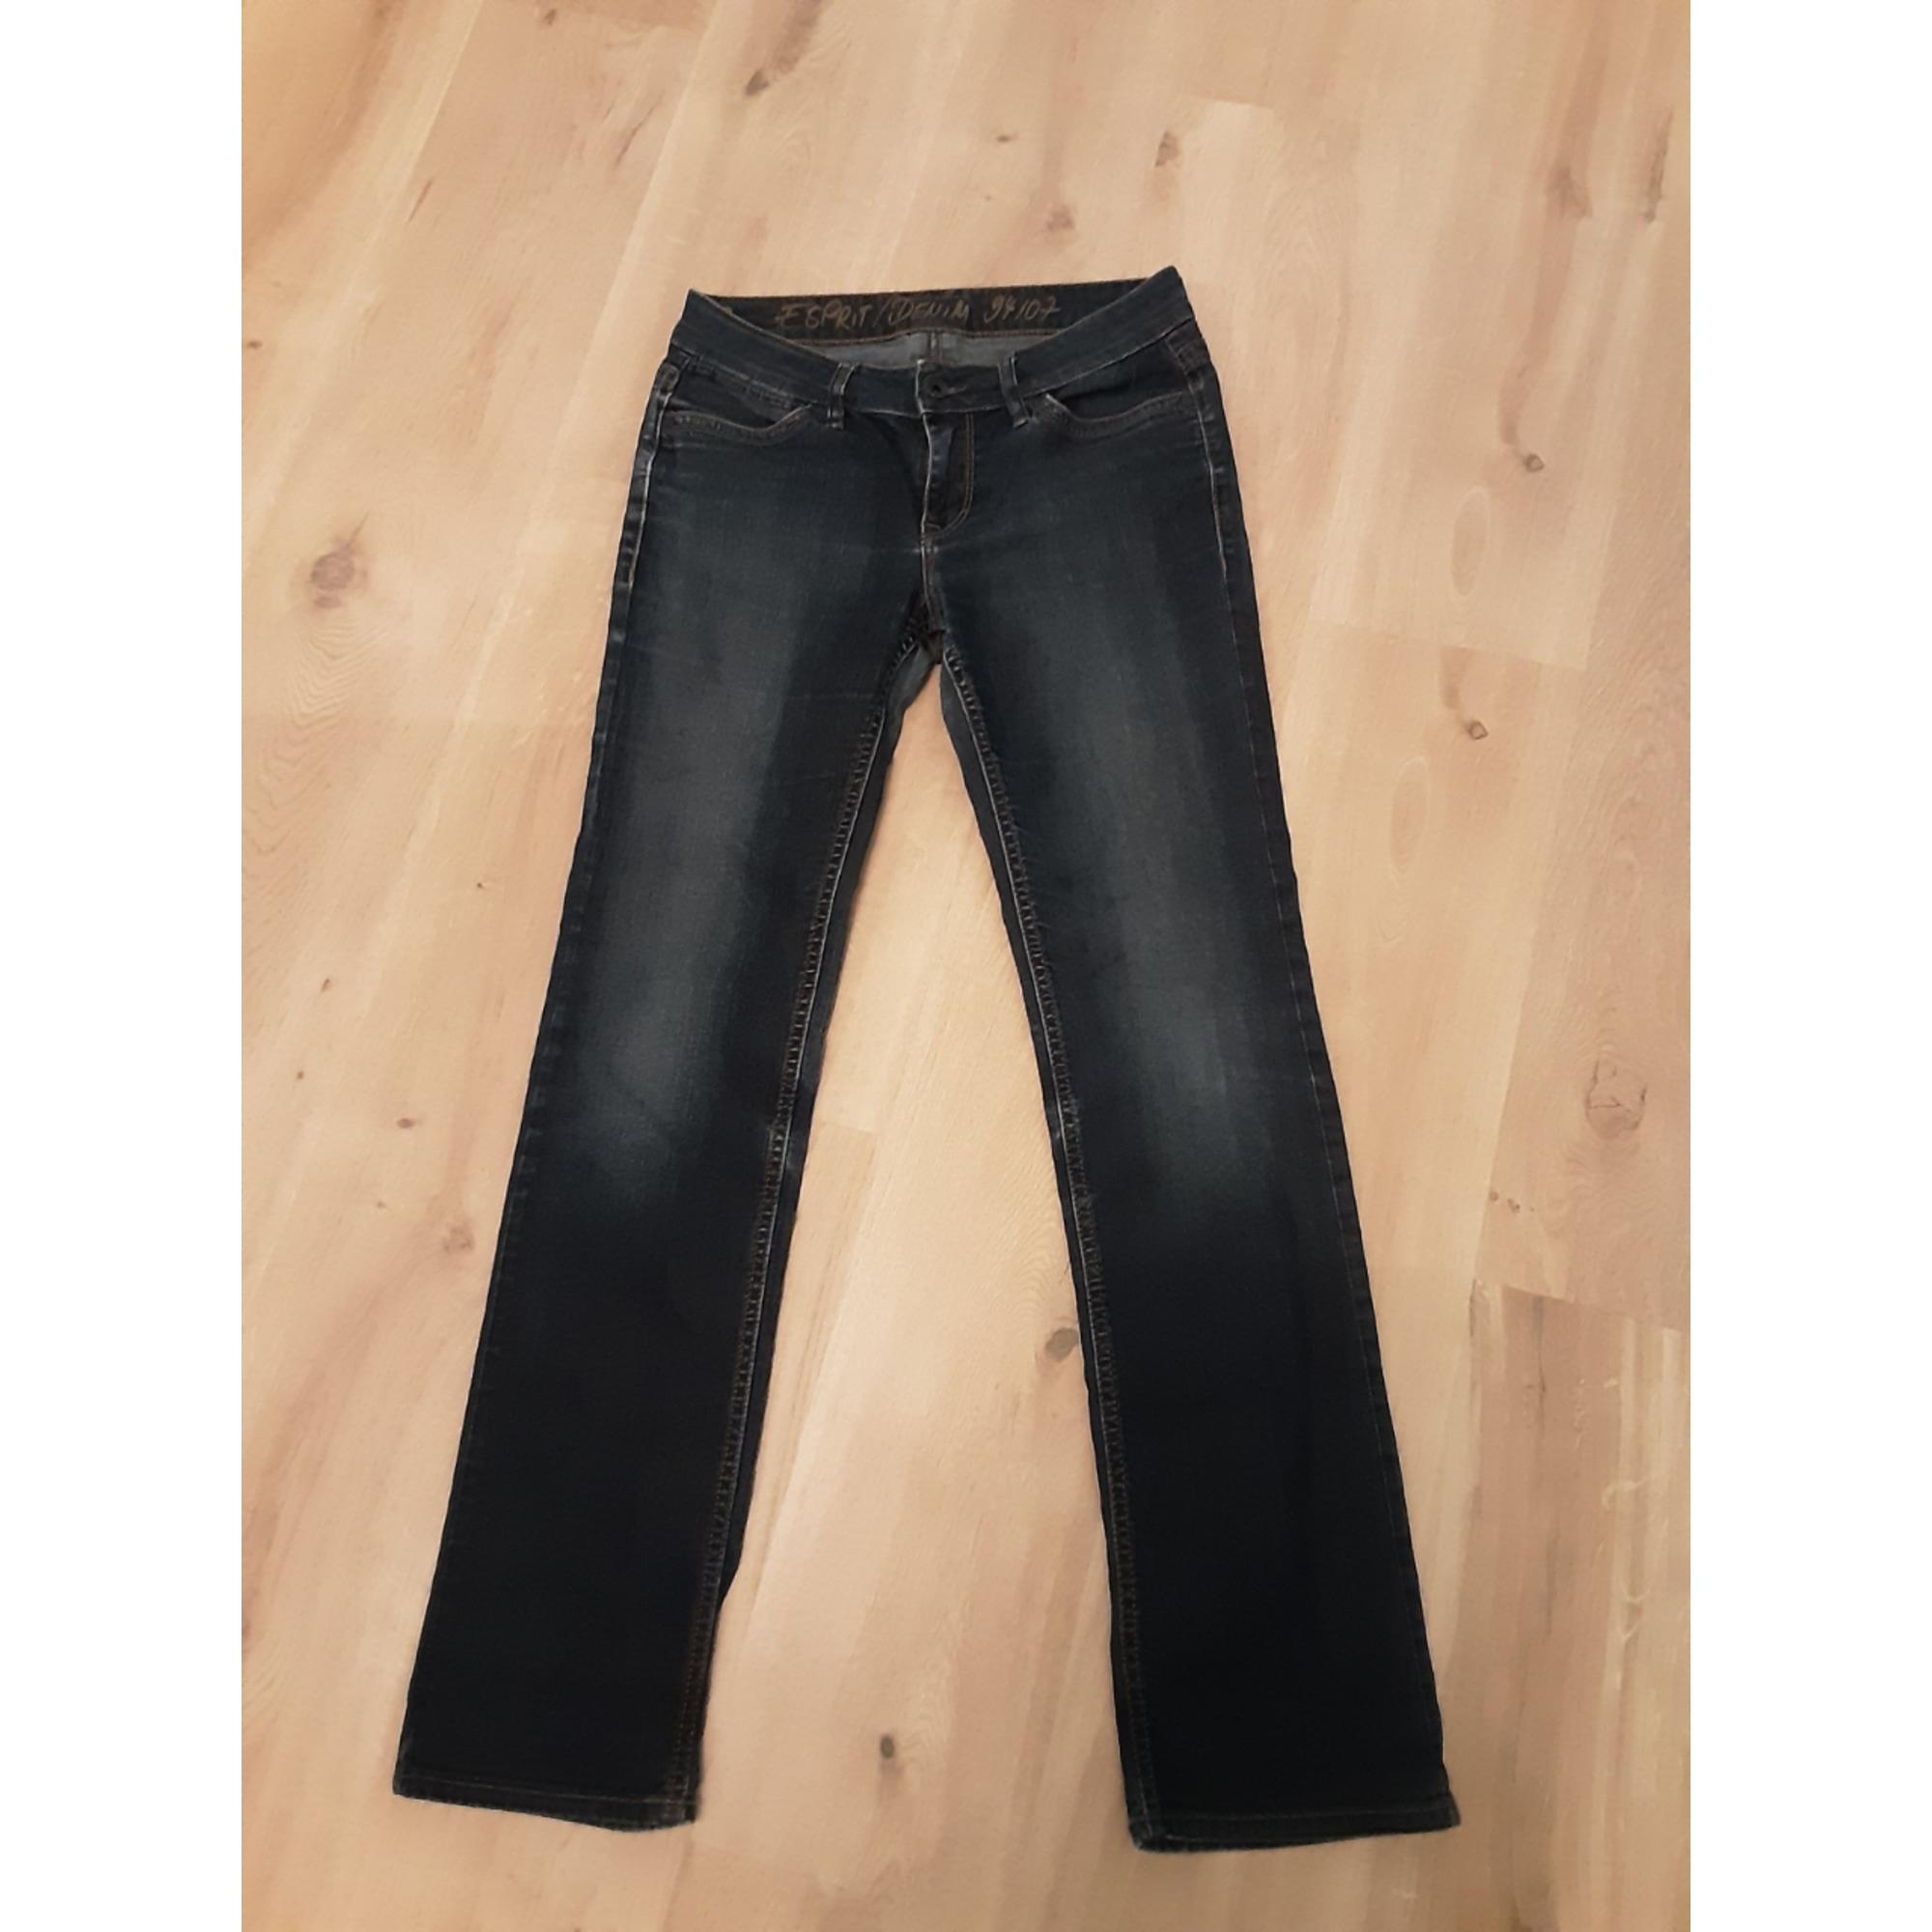 Jeans droit ESPRIT Bleu, bleu marine, bleu turquoise